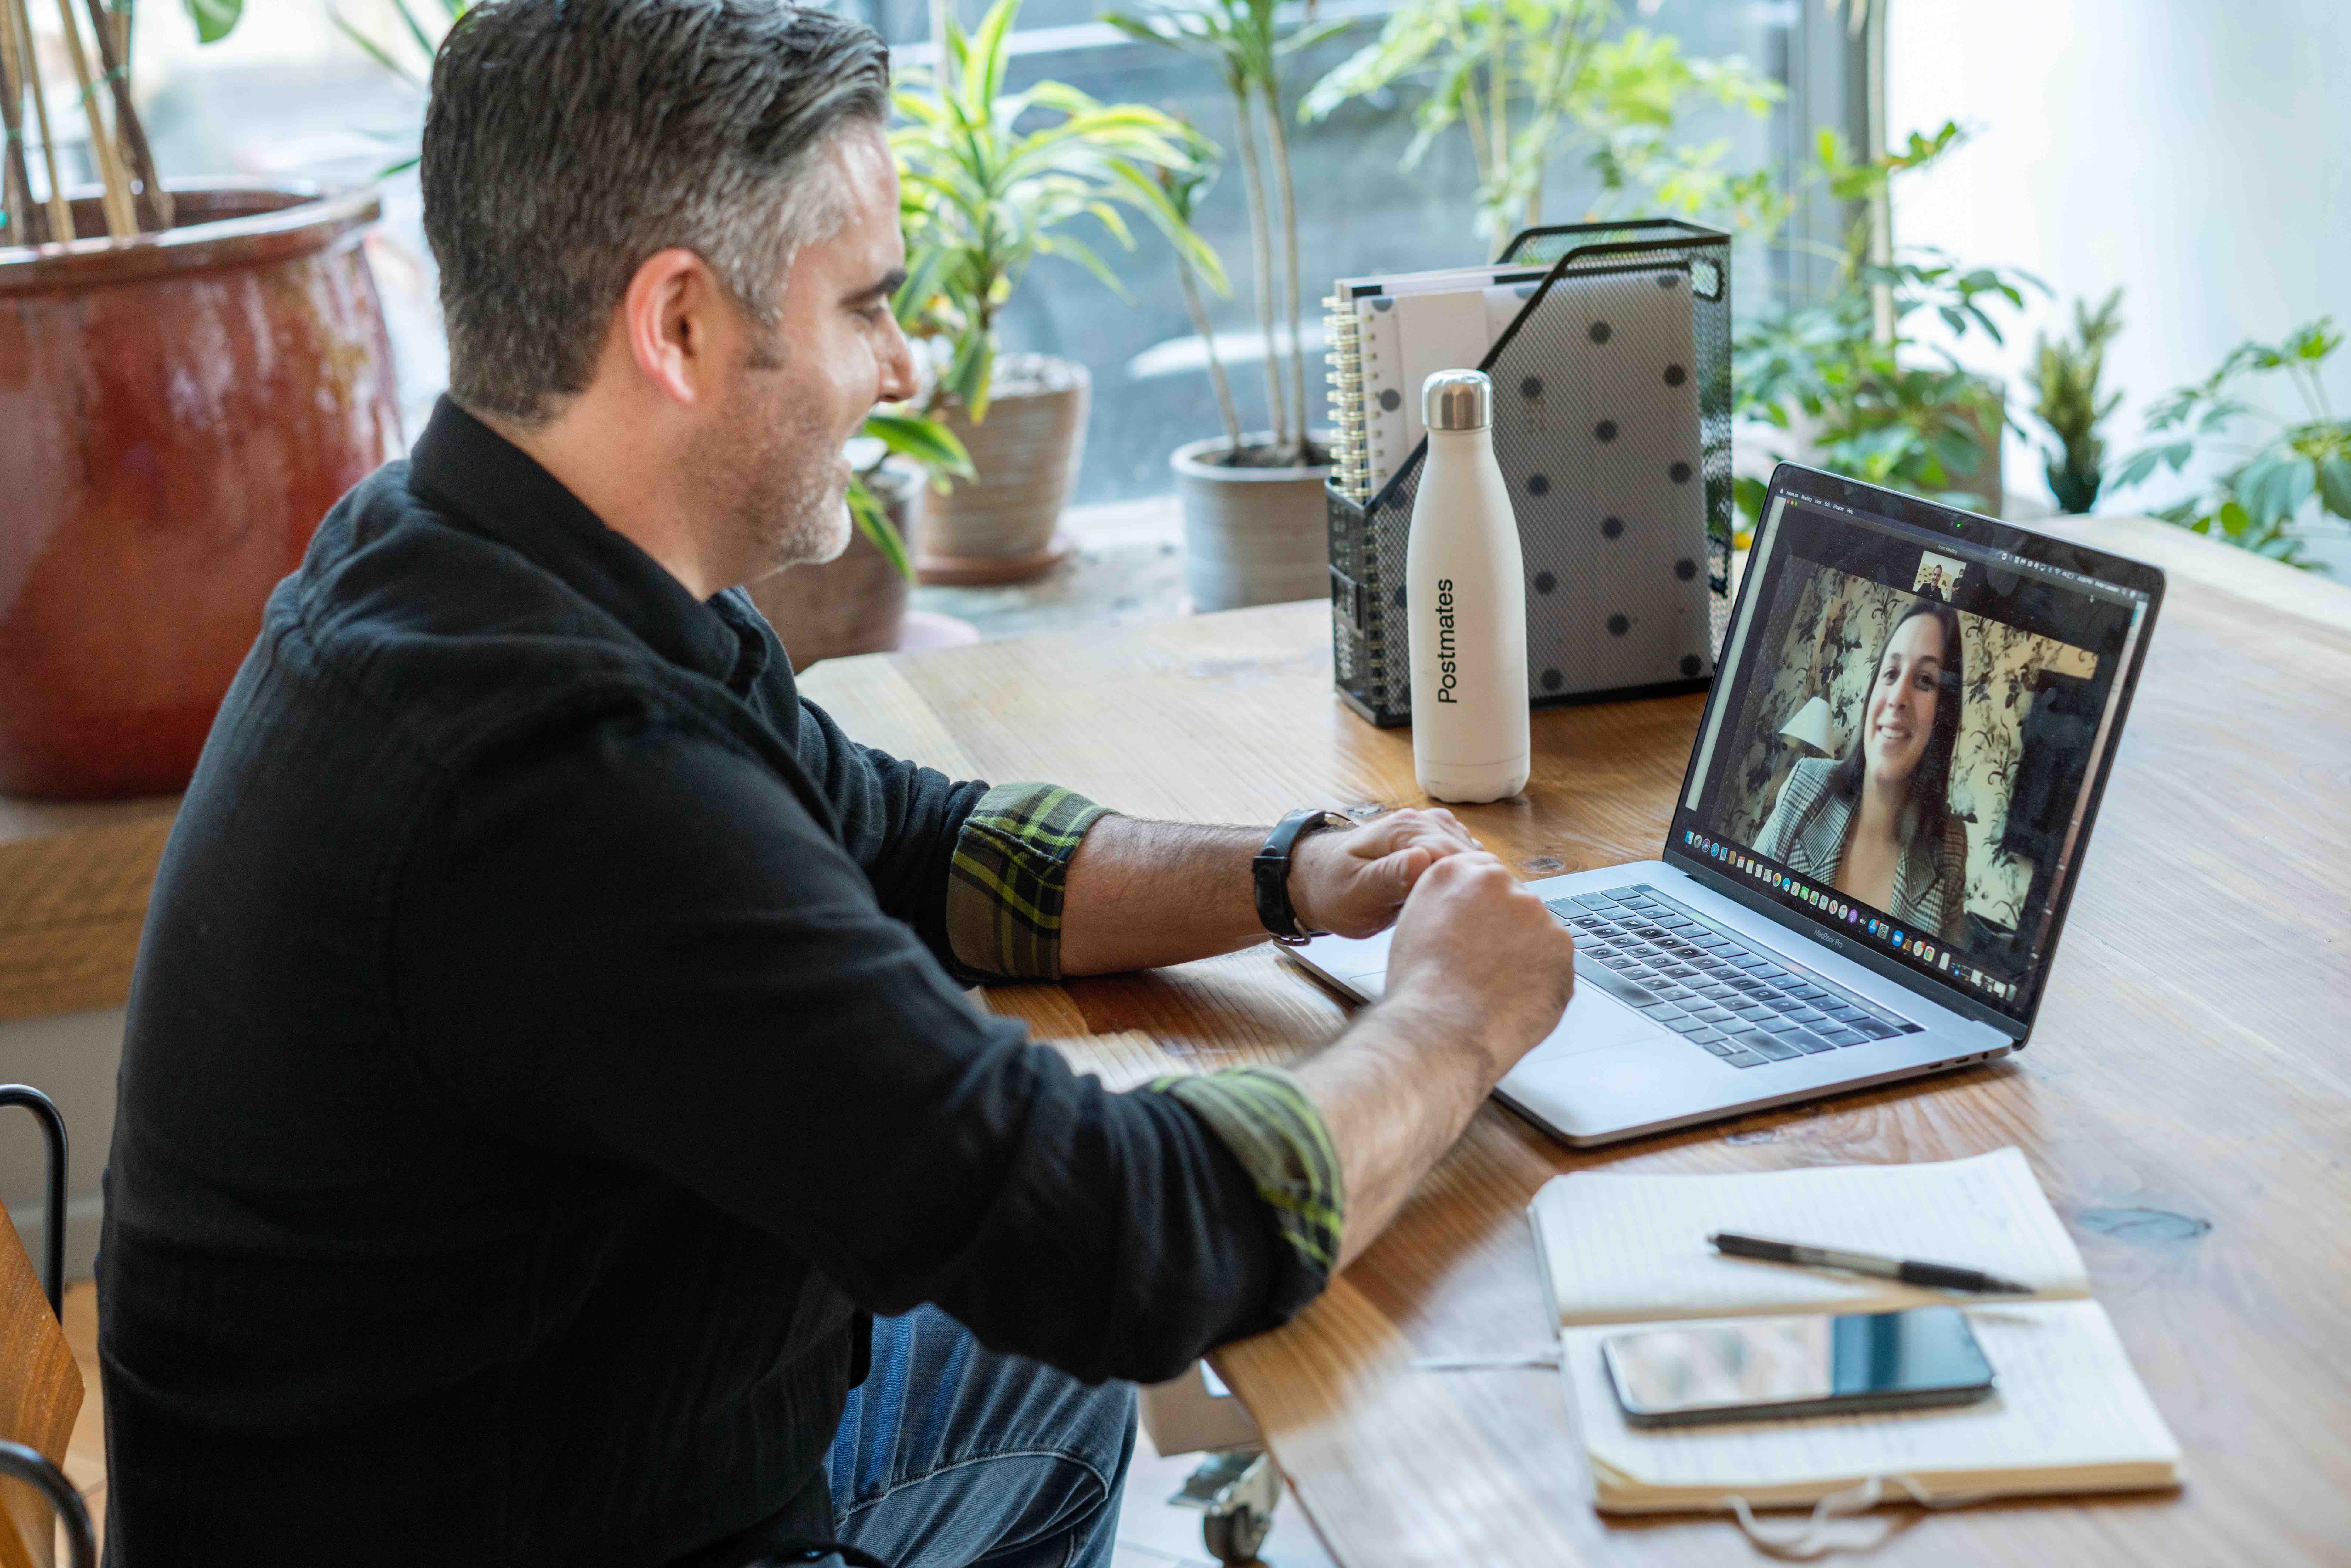 A recruiter screening a candidate virtually